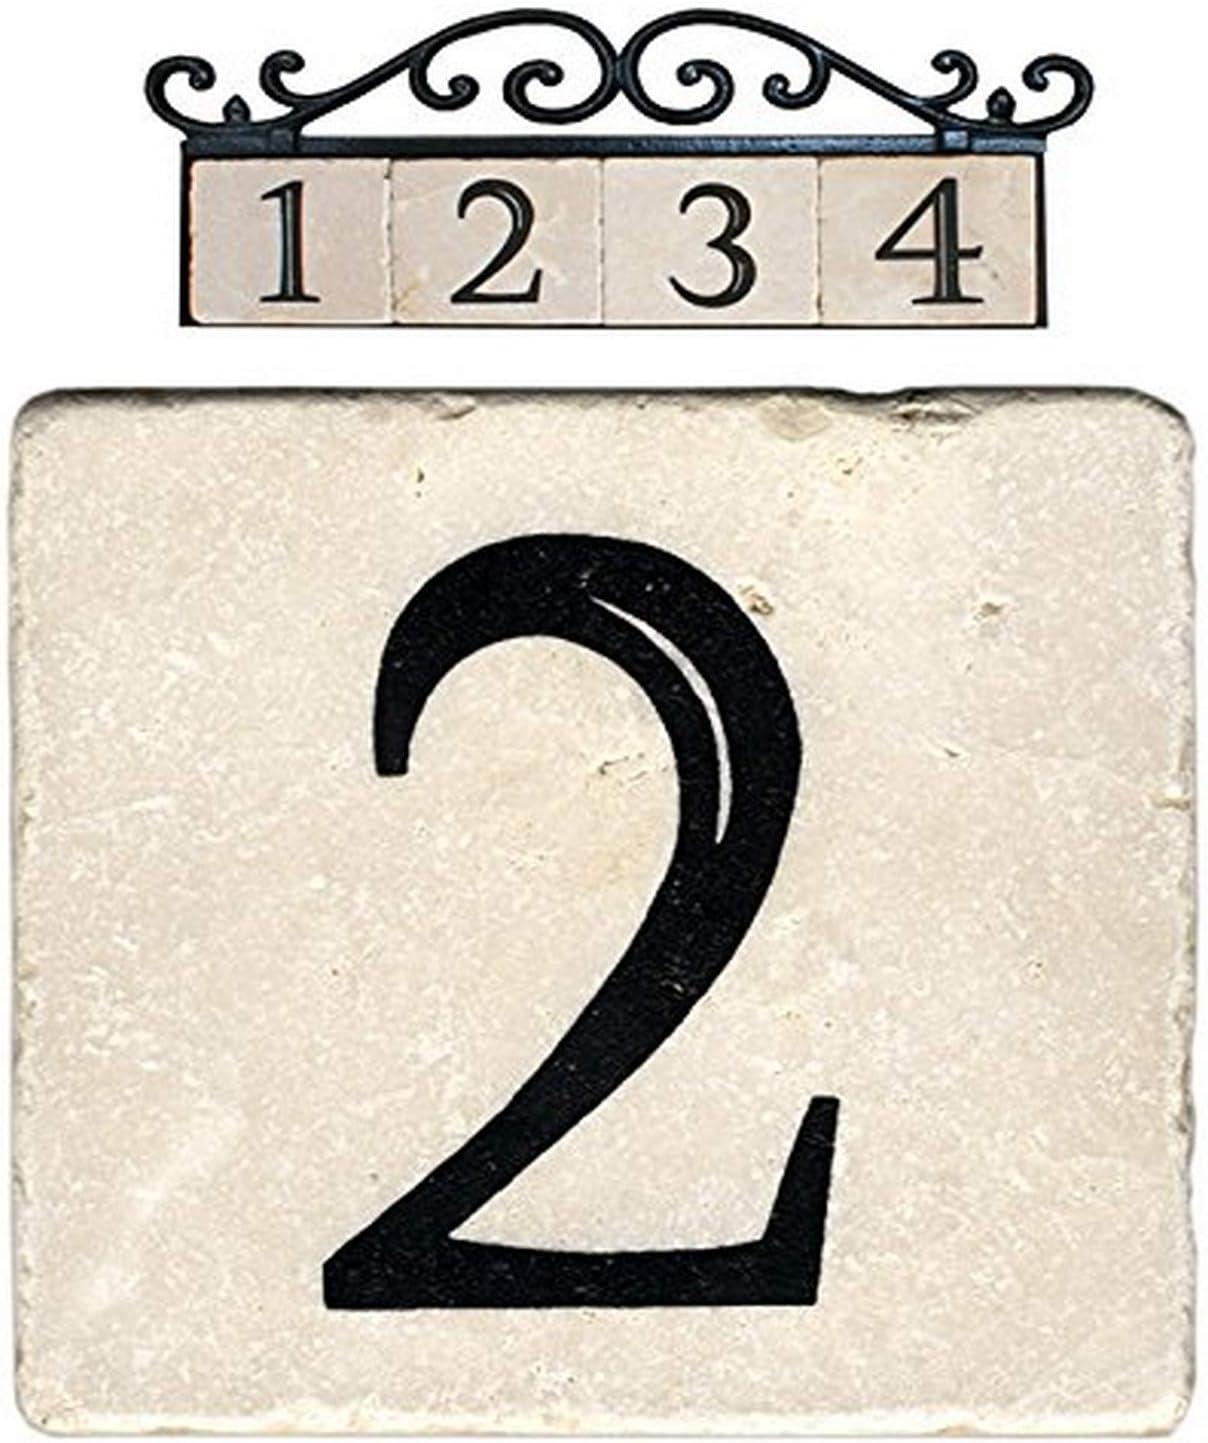 NACH AZ-CLASSIC House Address Number Tiles - #2, Marble/Beige, 4 x 4